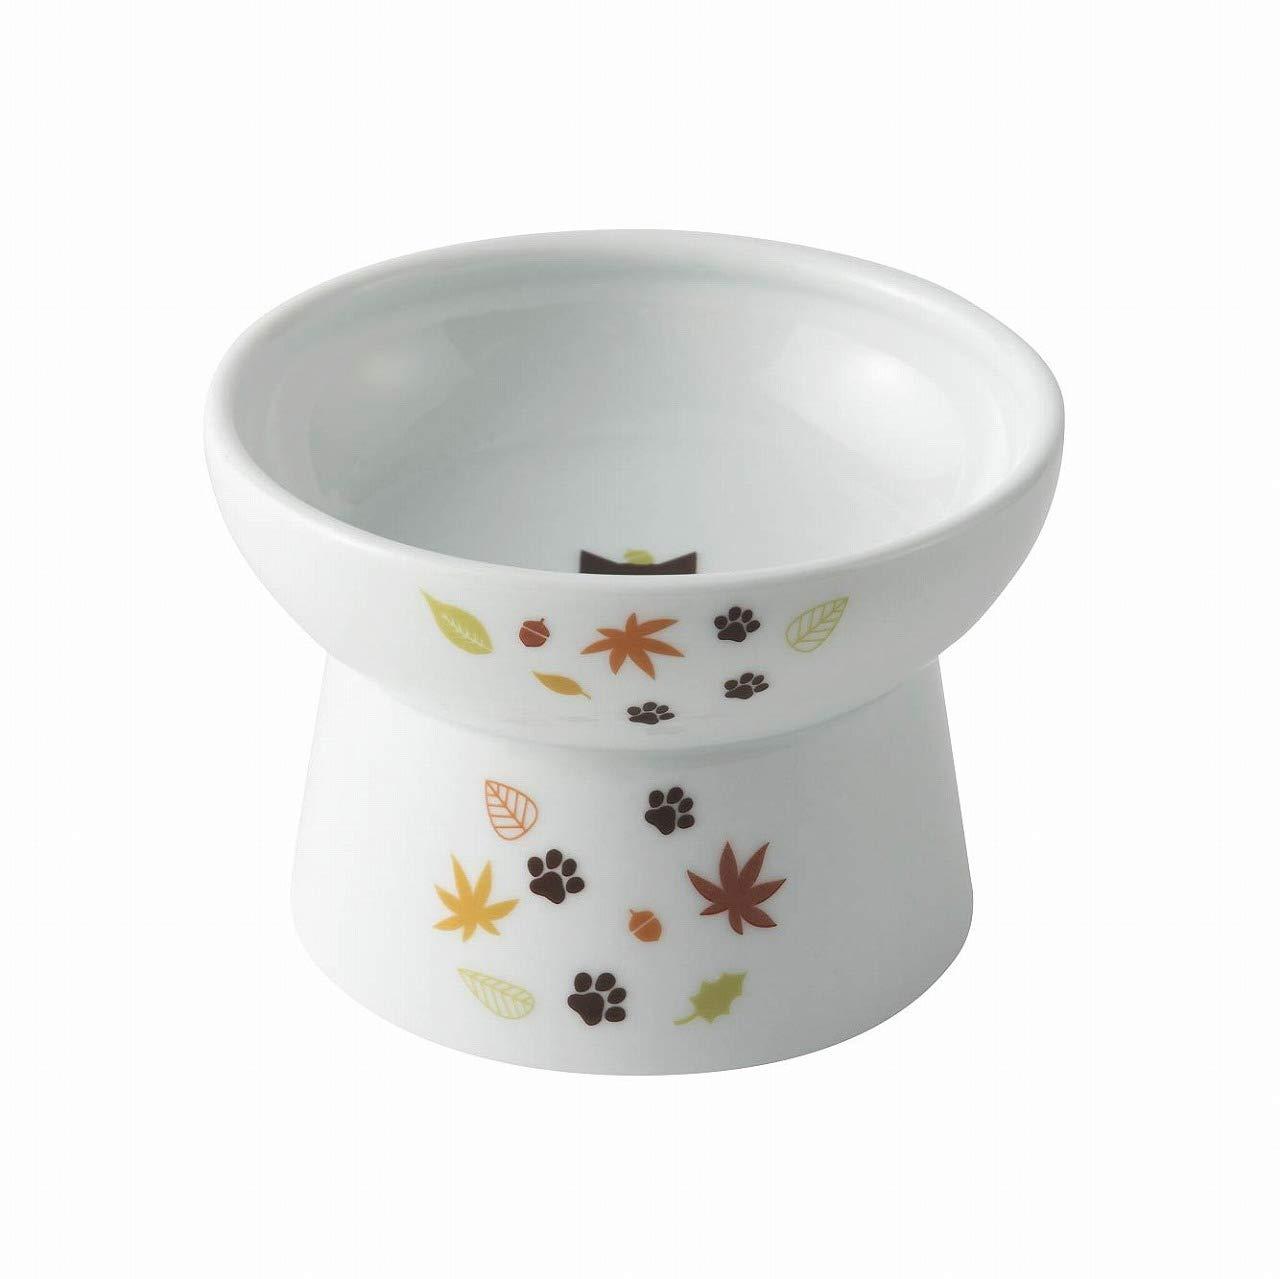 shirleyjj Necoichi Raised Cat Food Bowl (Leaf Limited Edition, Regular) by shirleyjj